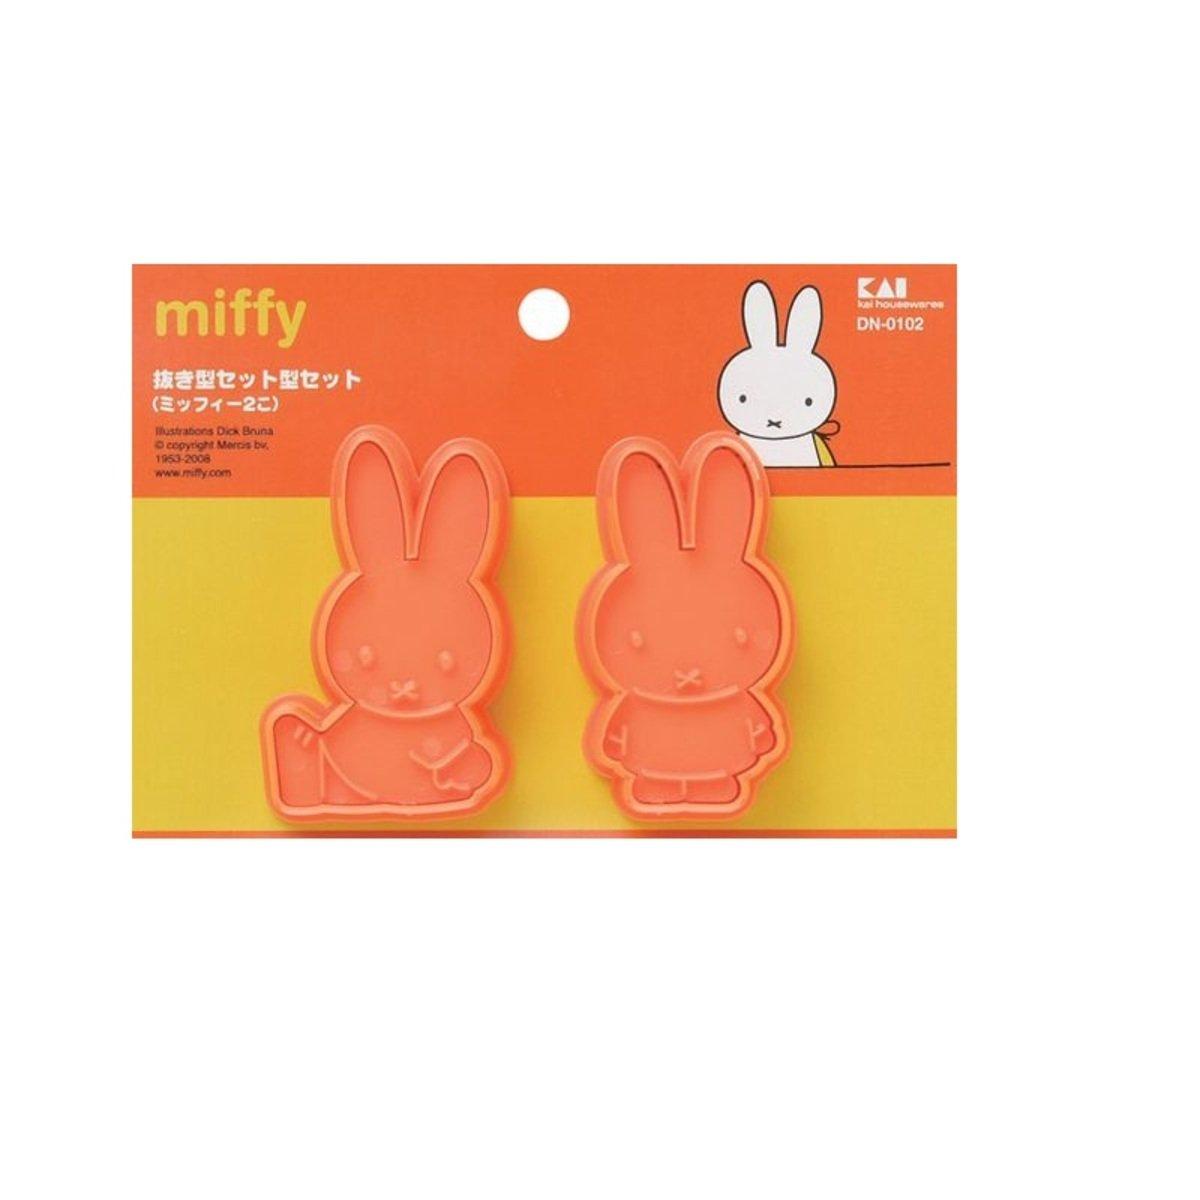 DN0102 Miffy 曲奇模 (2件裝 - Miffy)